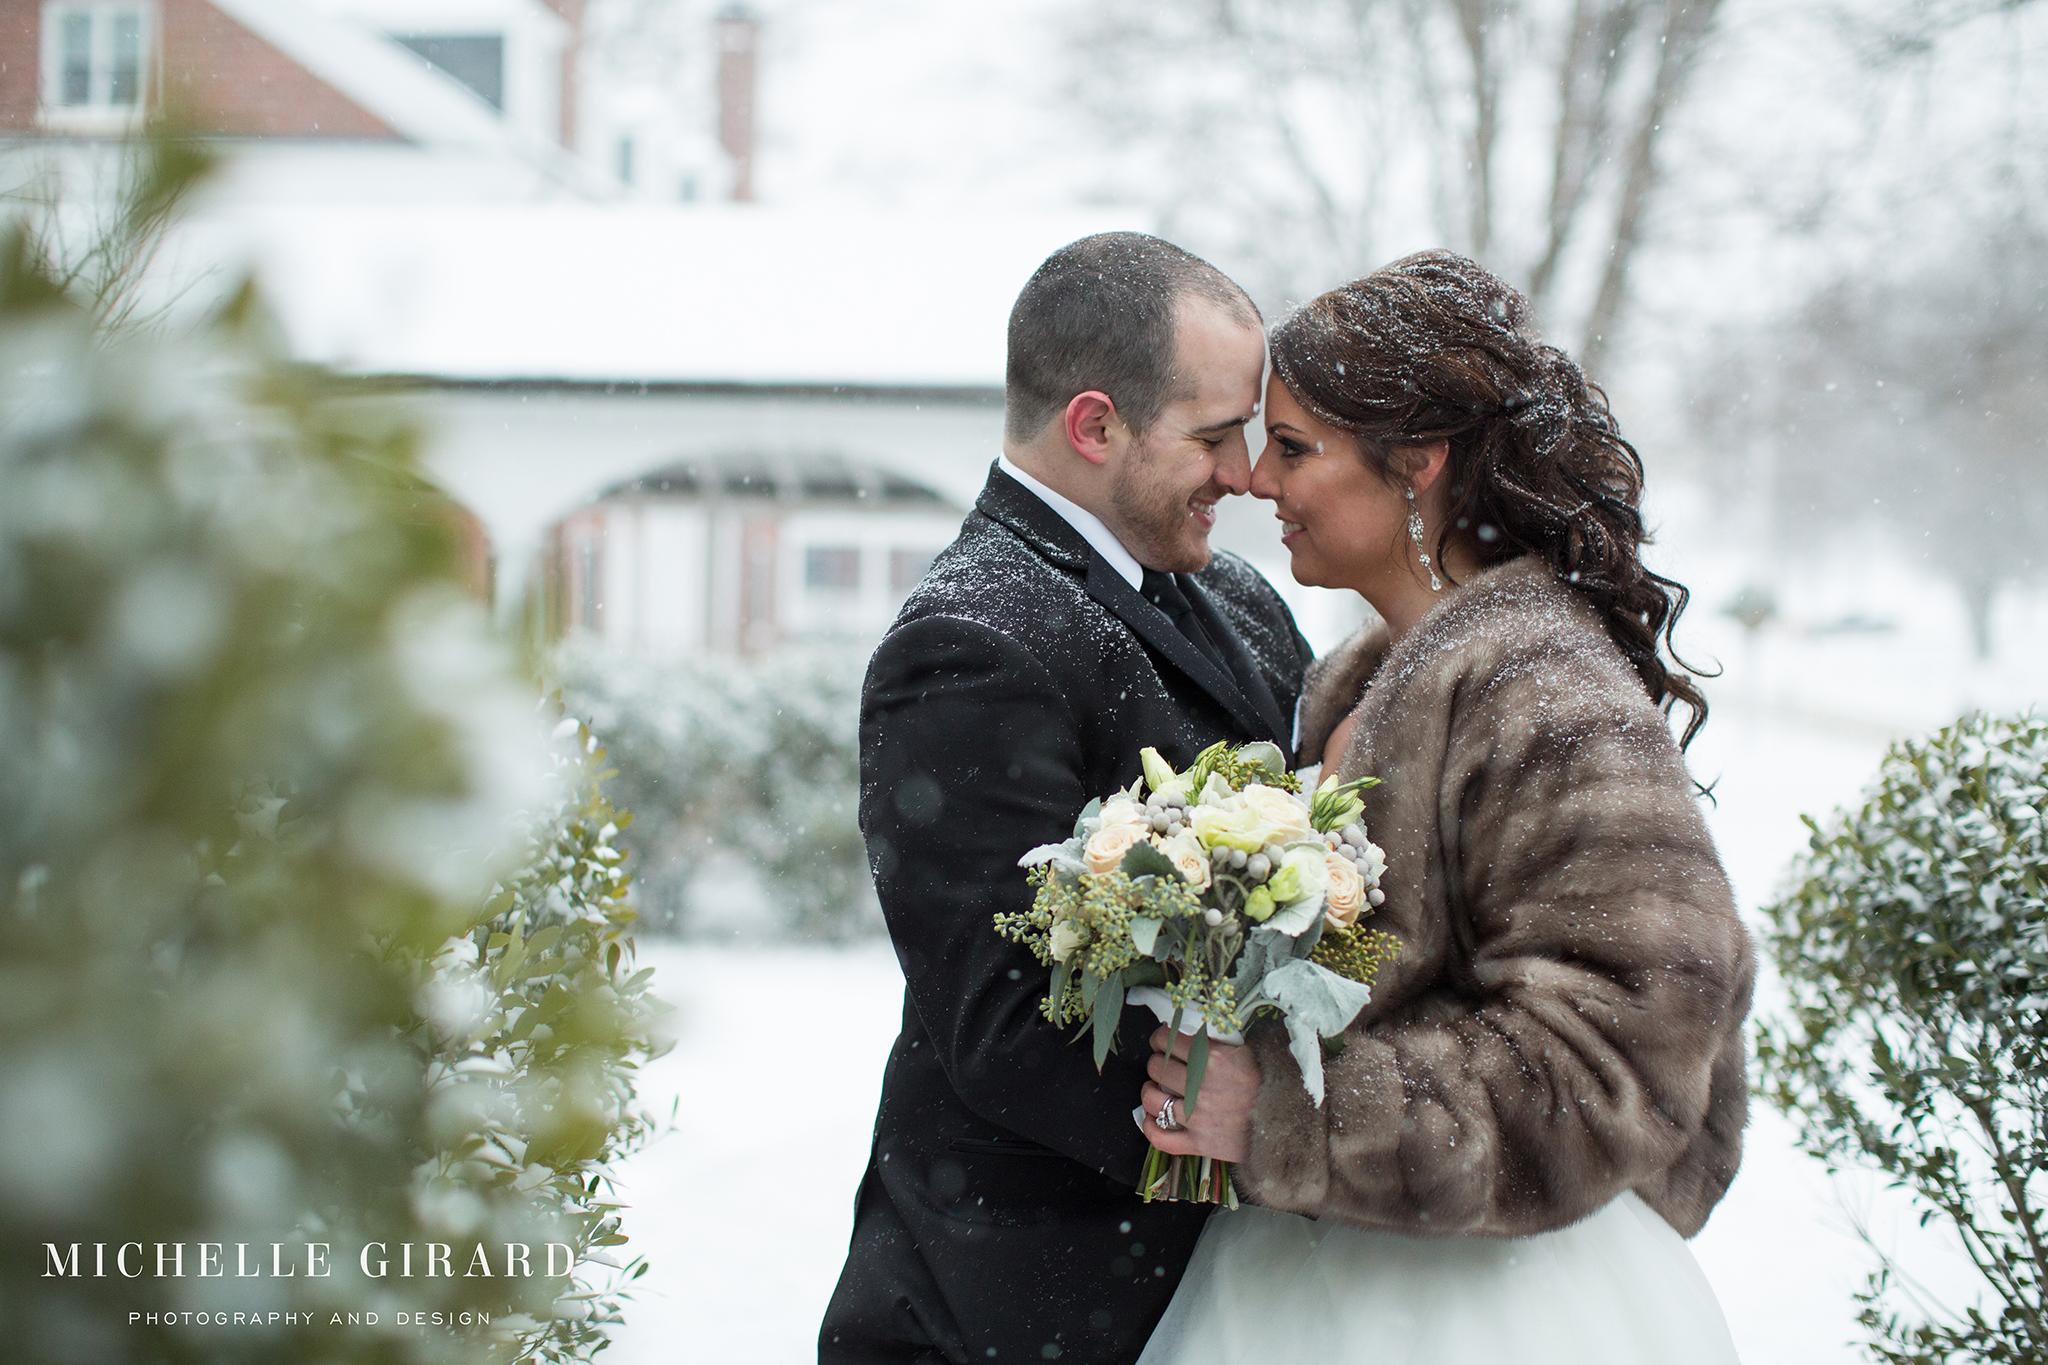 WinterWedding_LordJefferyInn_AmherstMA_MichelleGirardPhotography08.jpg